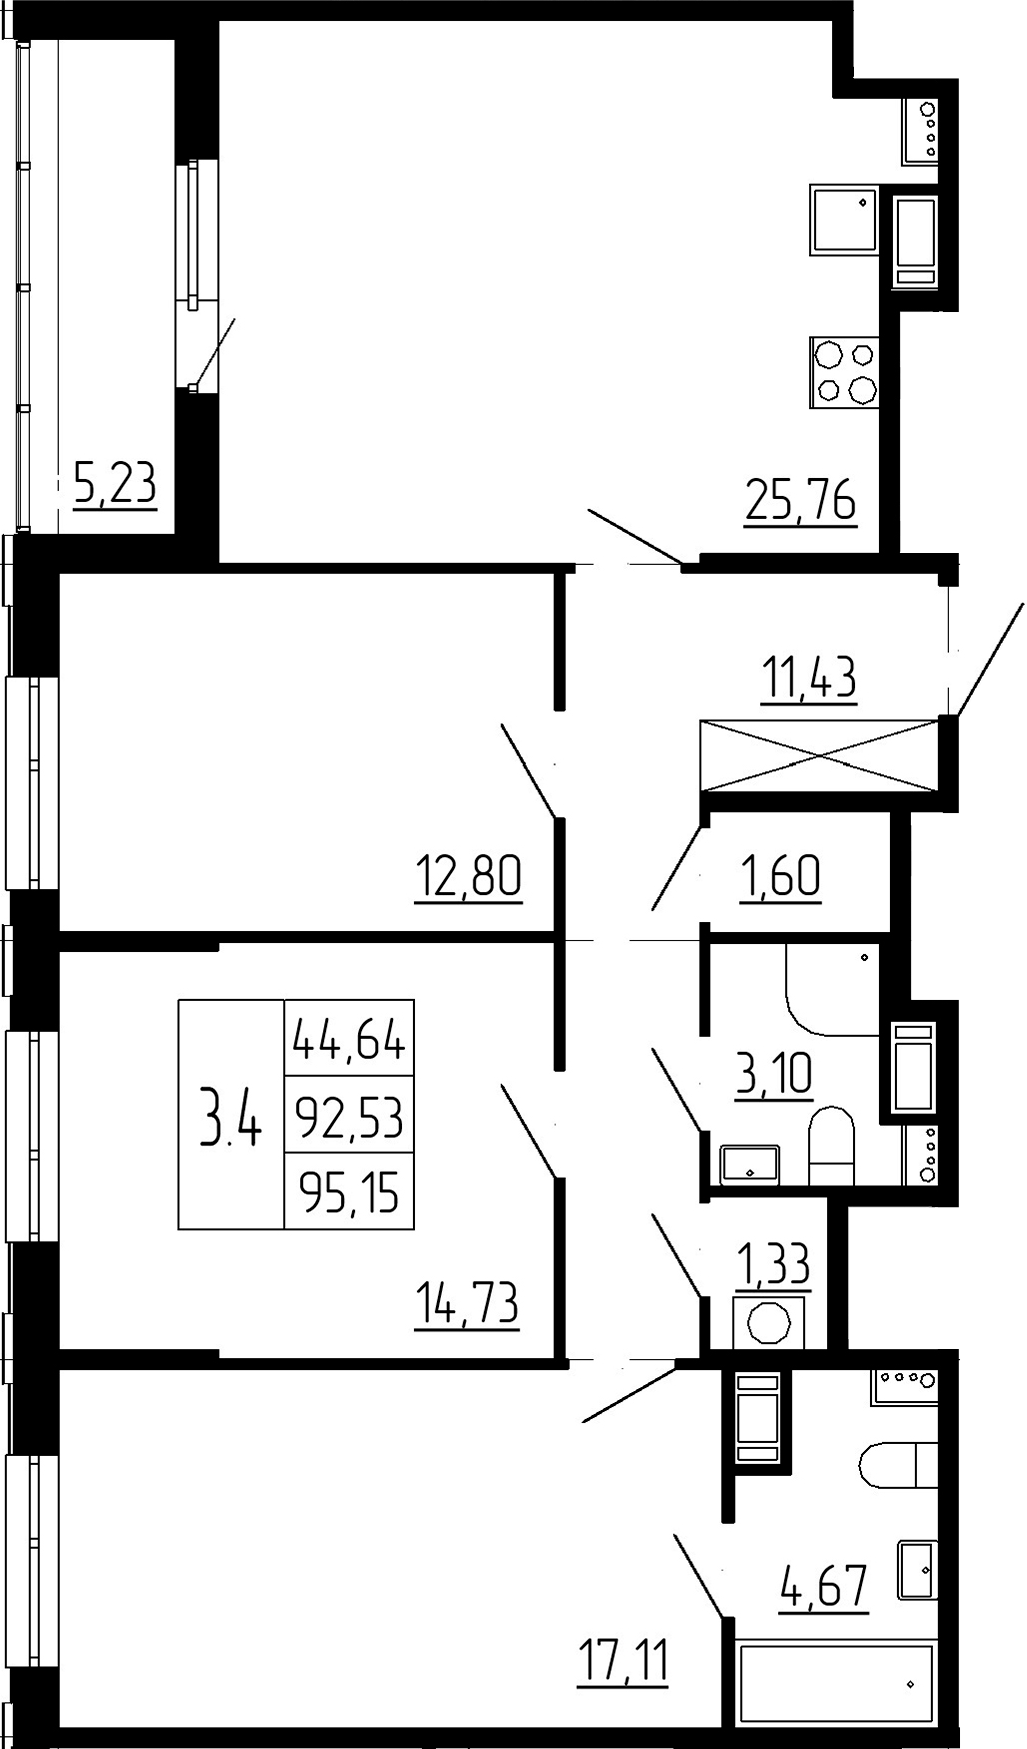 4Е-к.кв, 92.53 м²